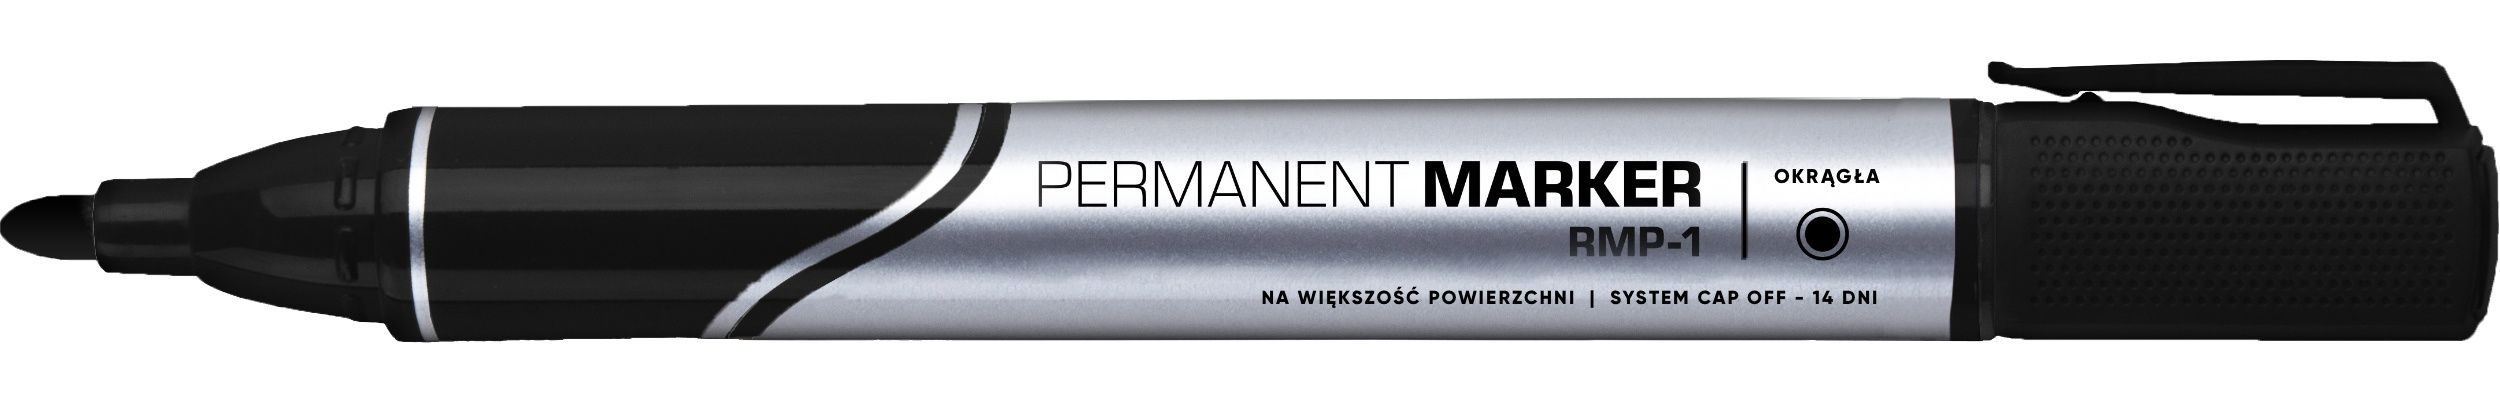 RMP-1 Permanent Marker